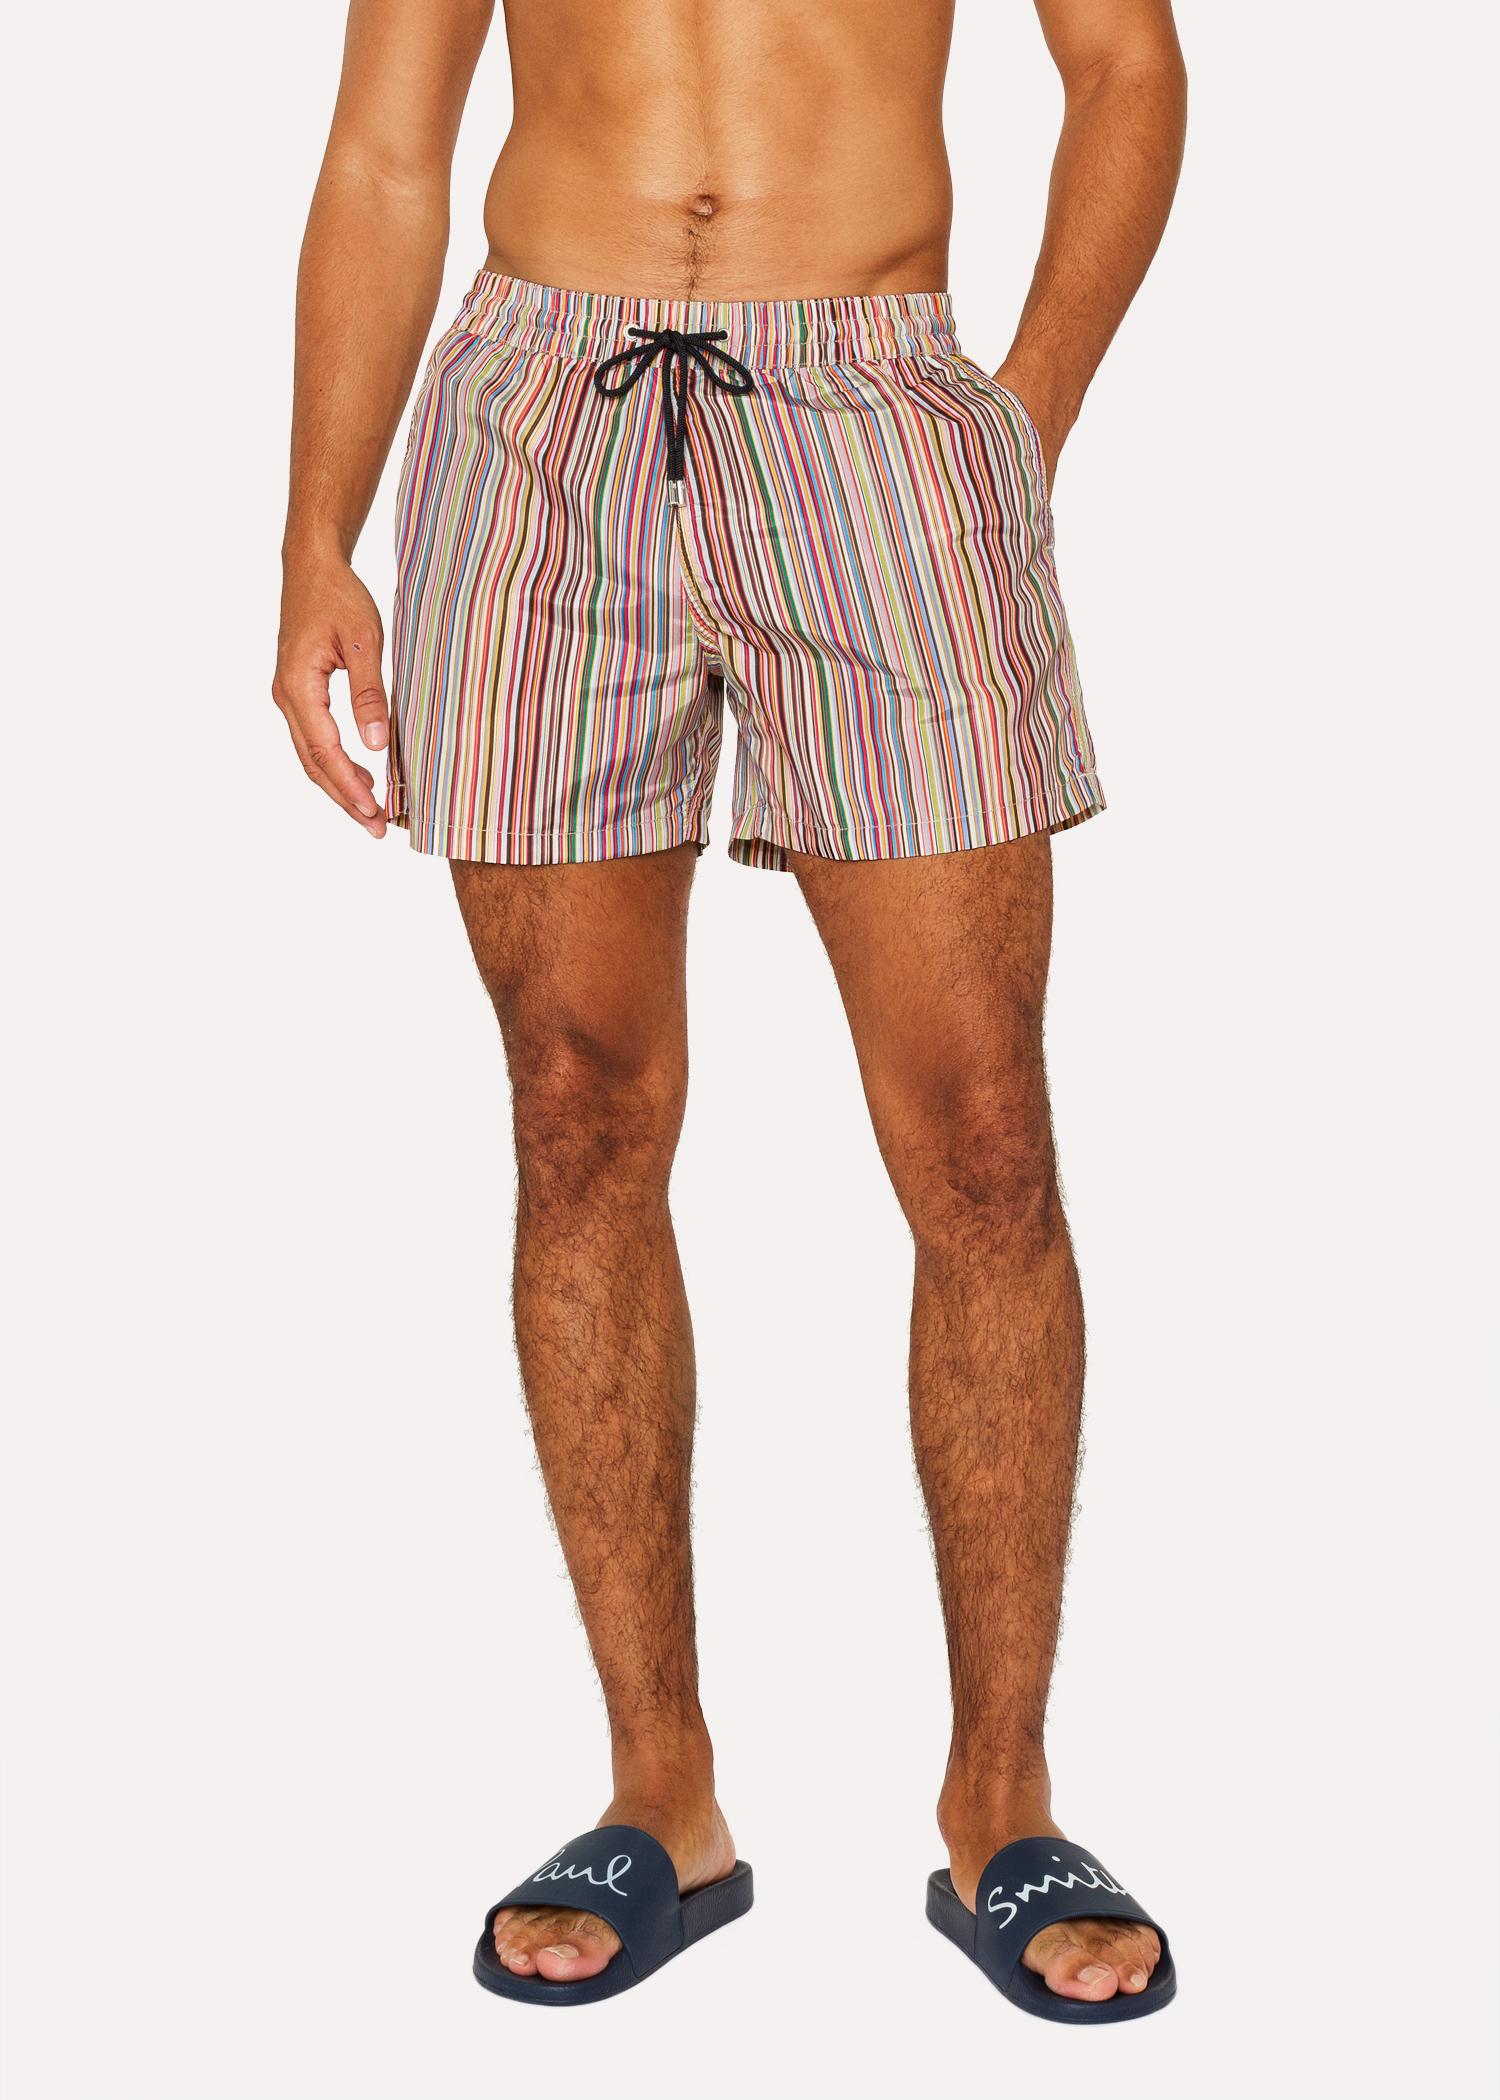 2a95d06dae77 Men's 'Signature Stripe' Print Swim Shorts